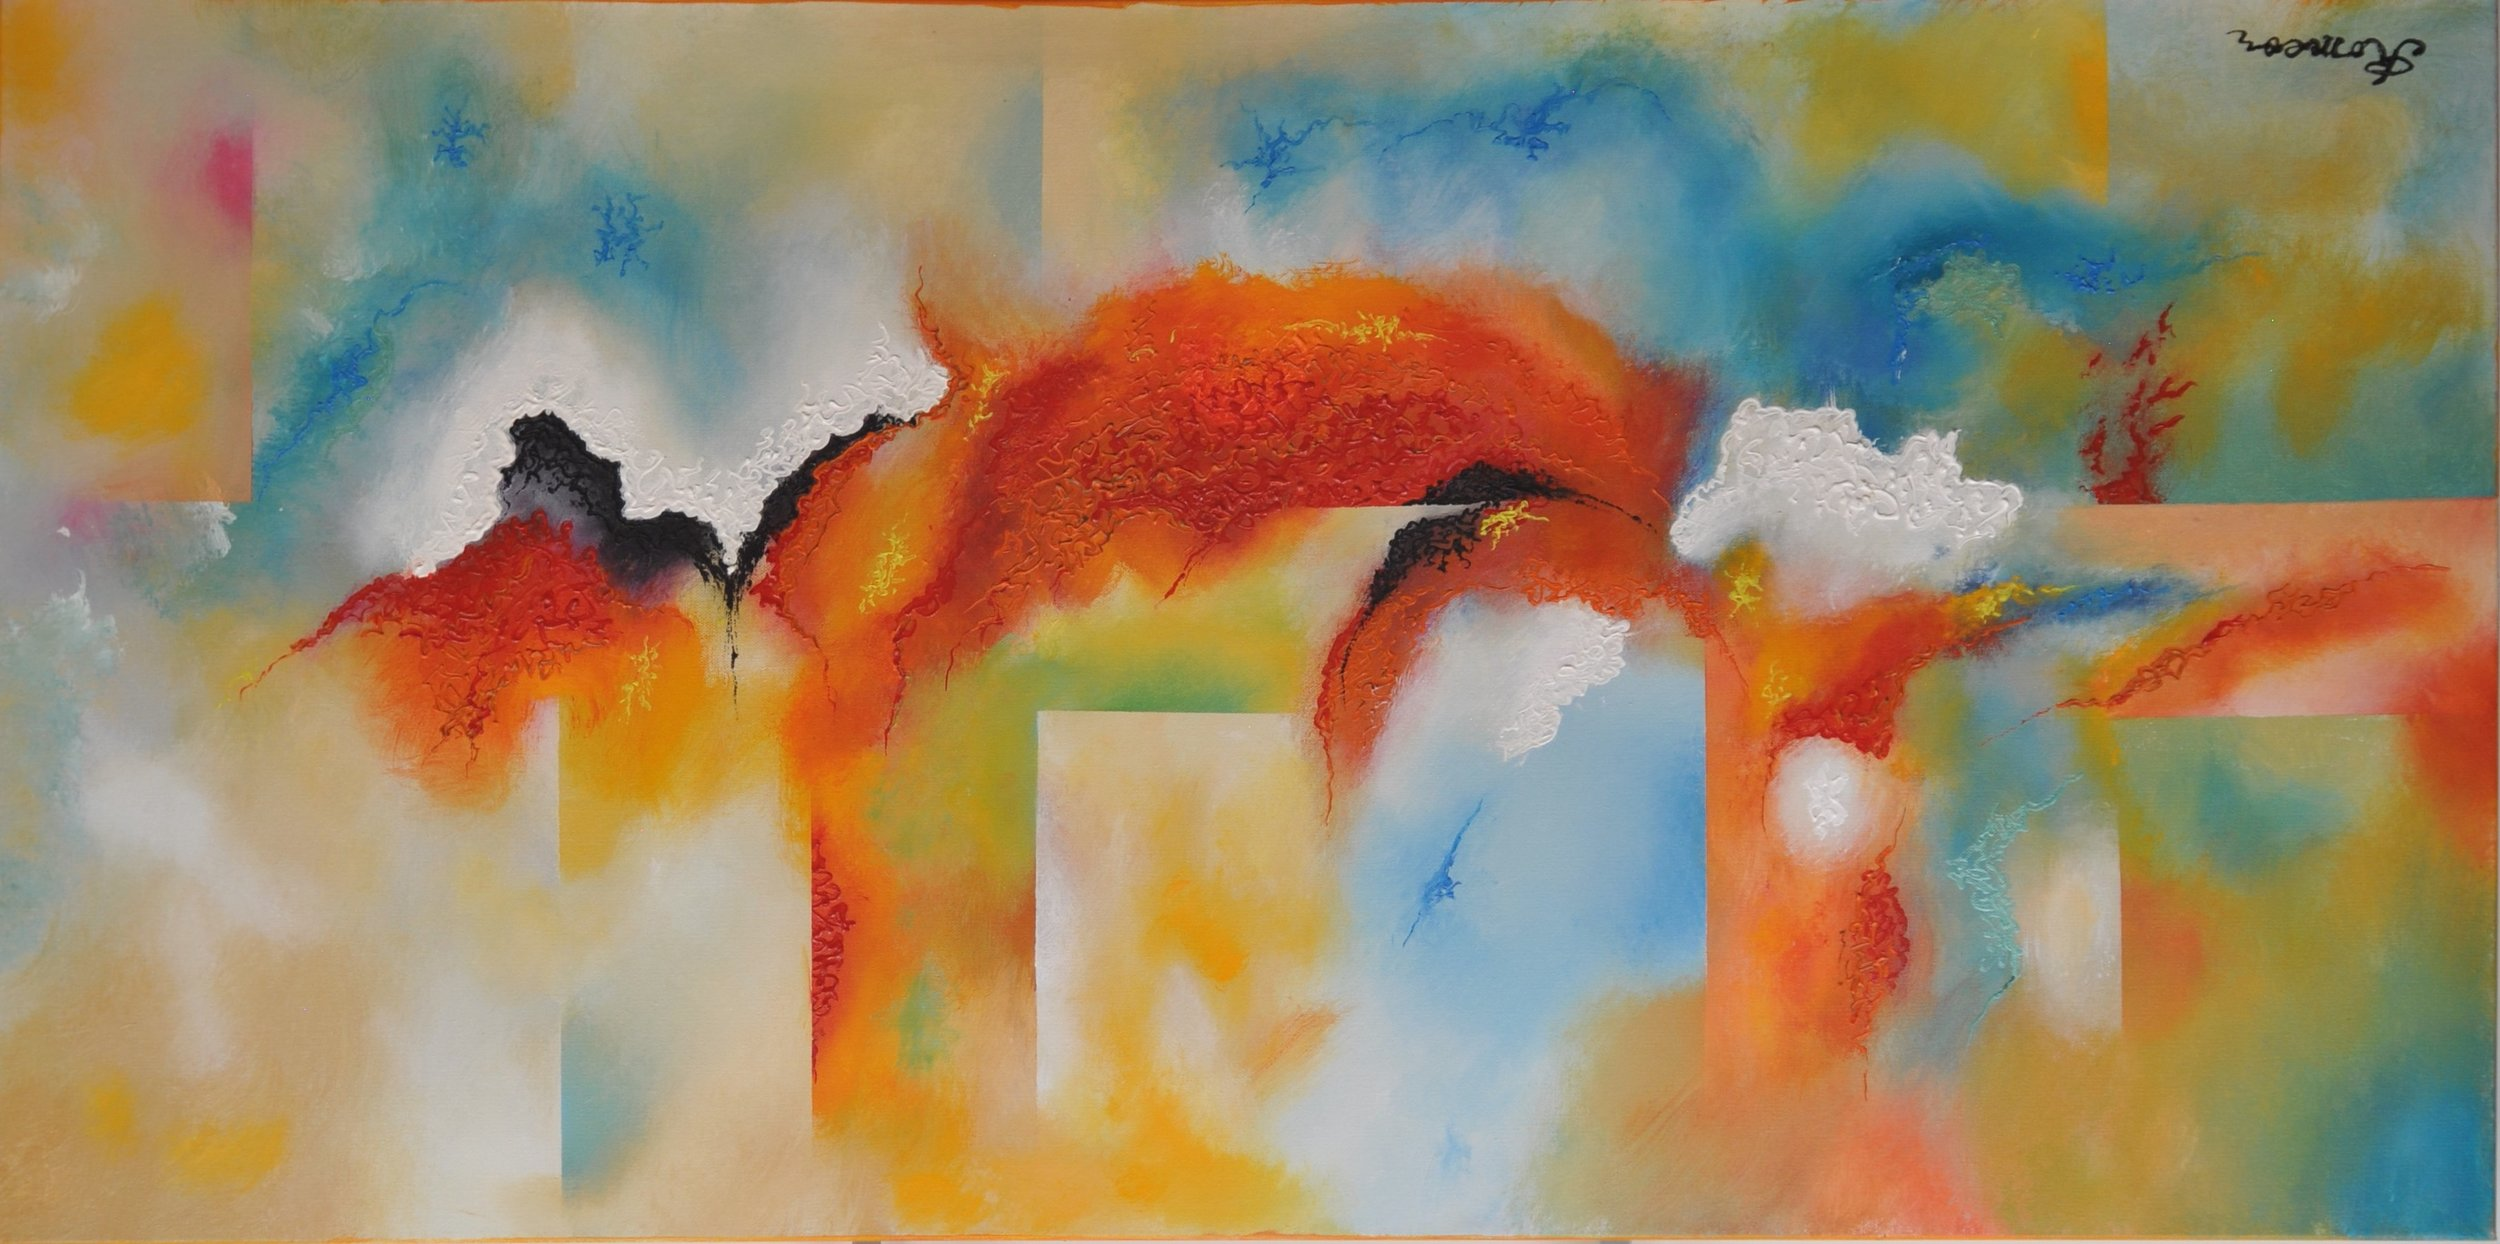 Good morning 1, acrylic on canvas, 24x48x1.5 inch, SKU 1090